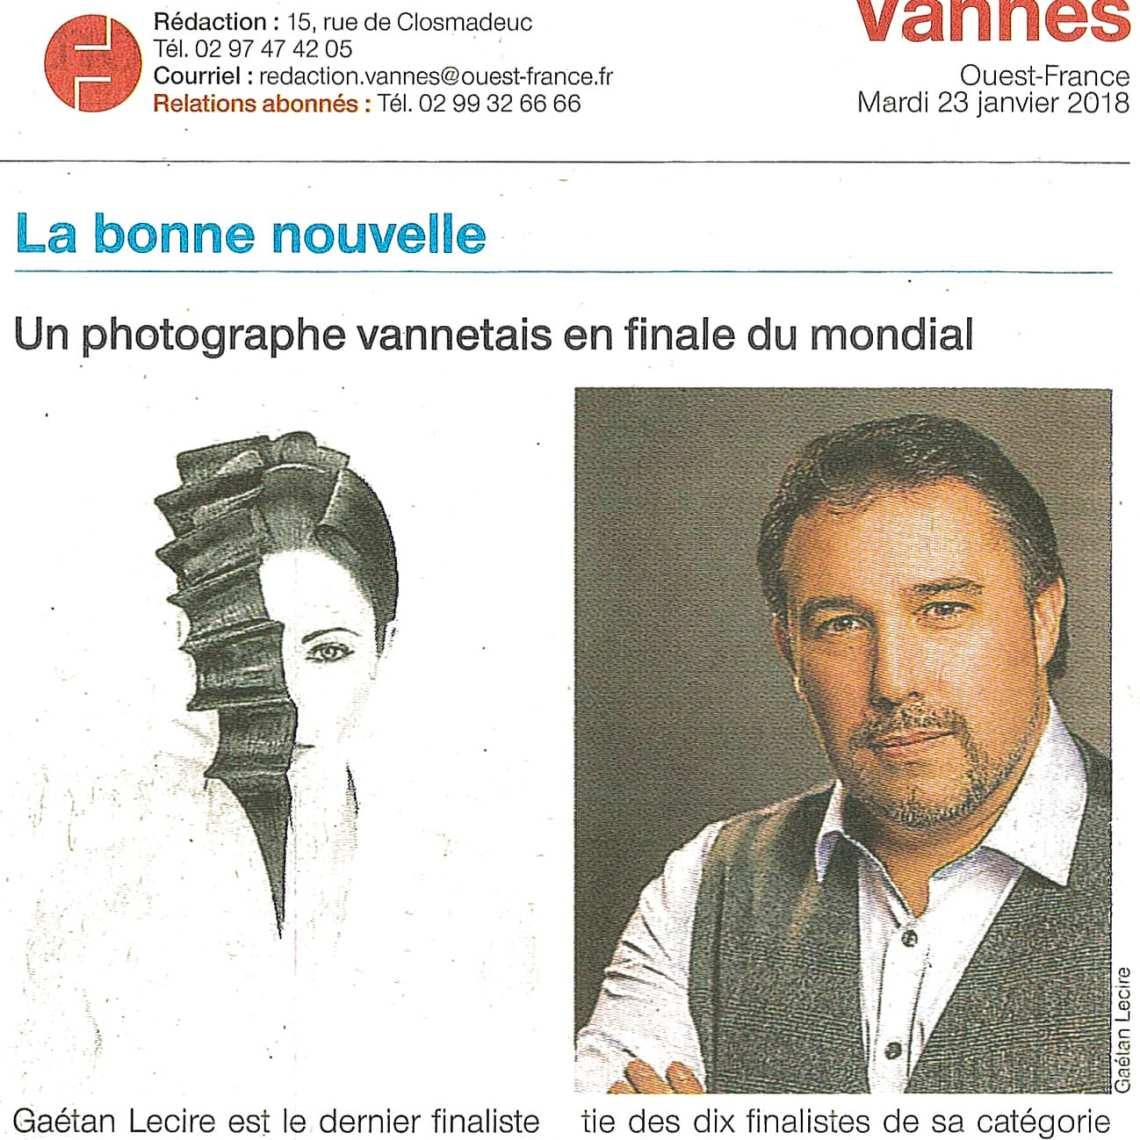 Photo © Gaetan Lecire